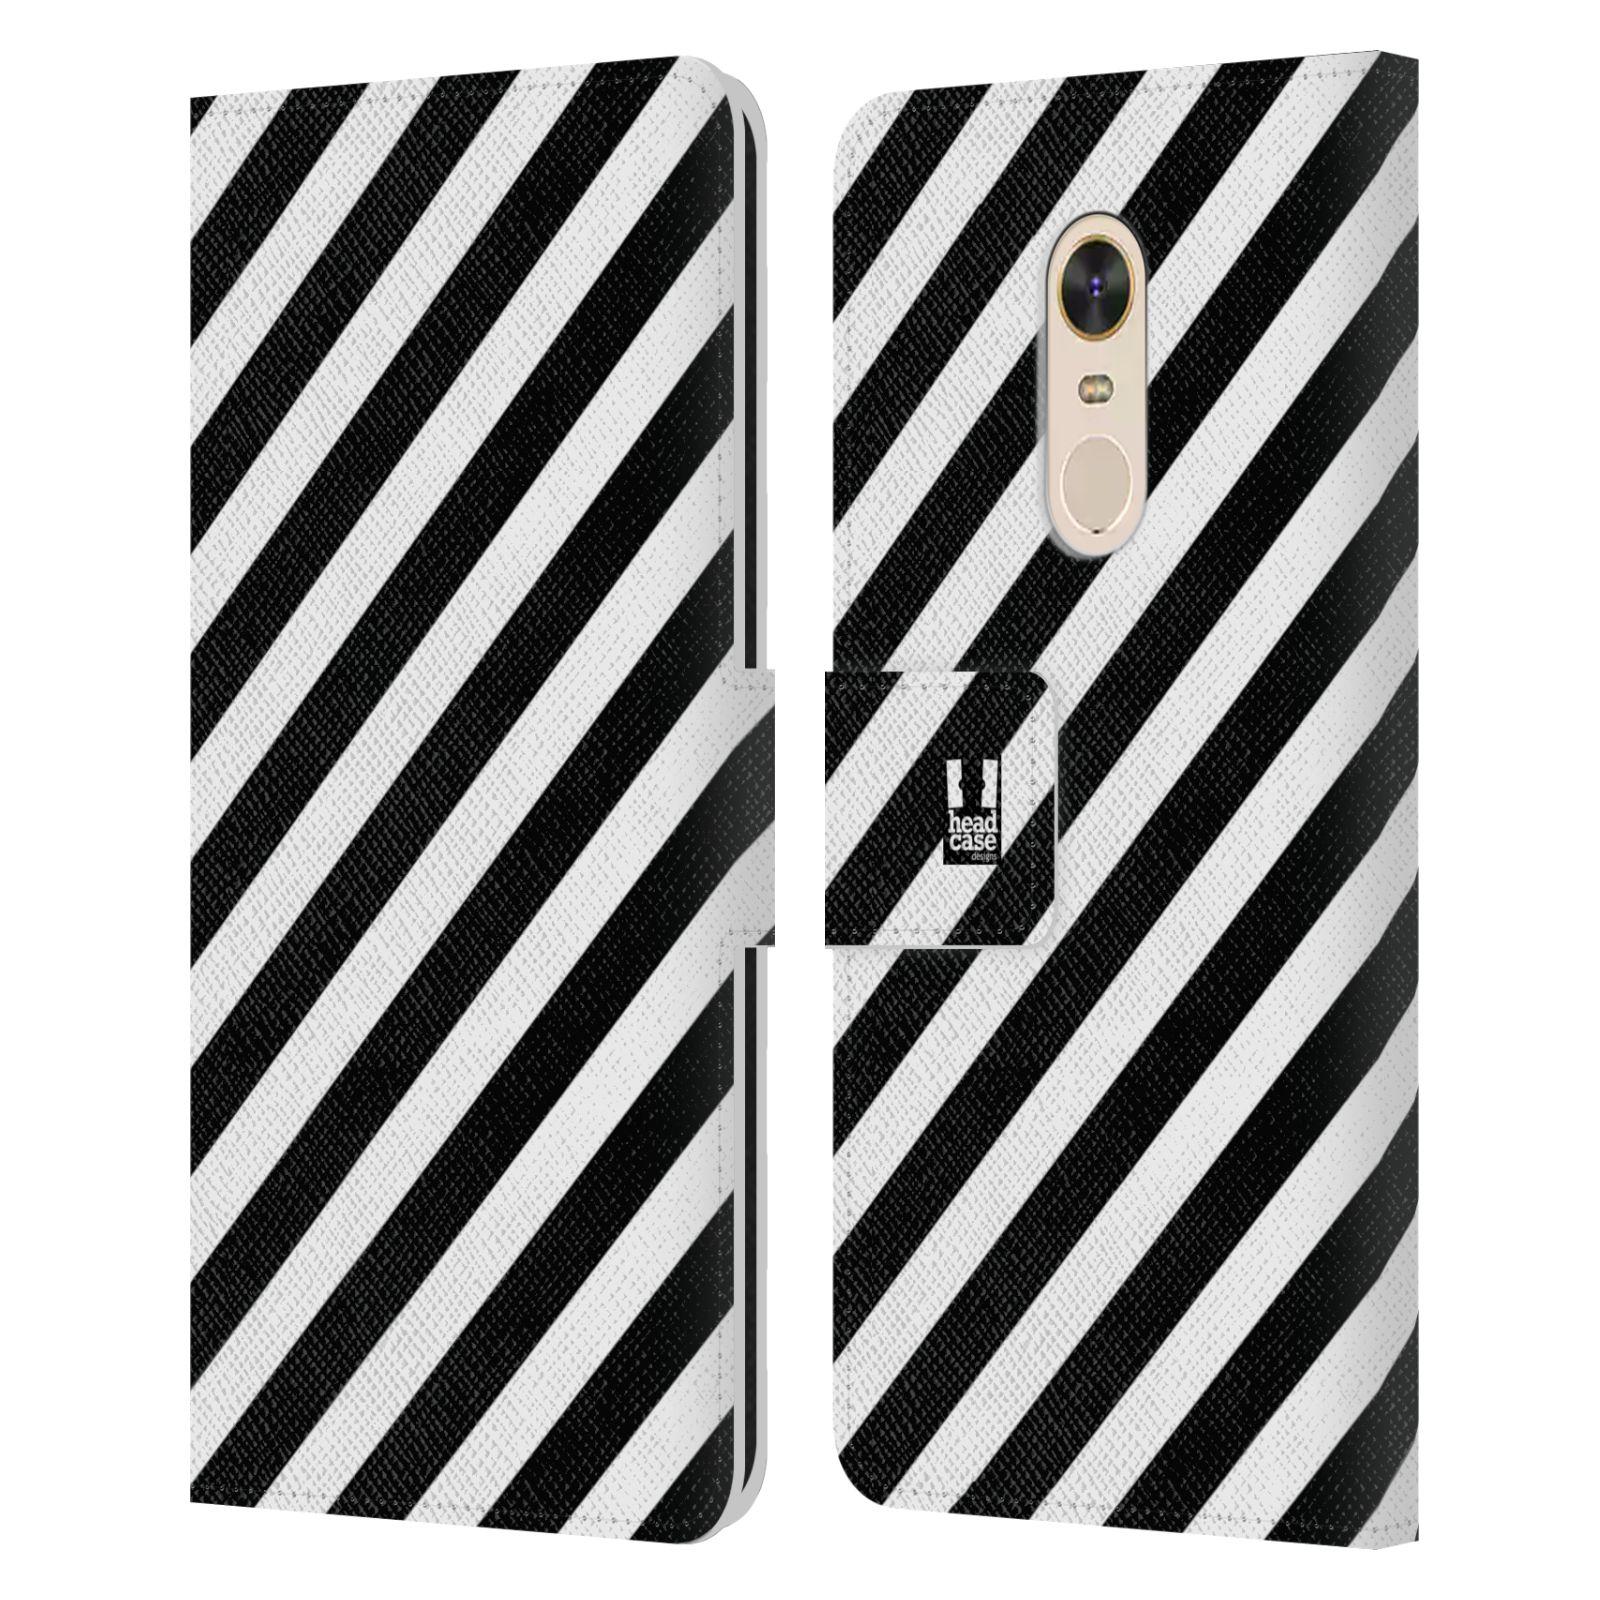 HEAD CASE Flipové pouzdro pro mobil Xiaomi Redmi Note 5 ČERNÁ A BÍLÁ zebra pruhy